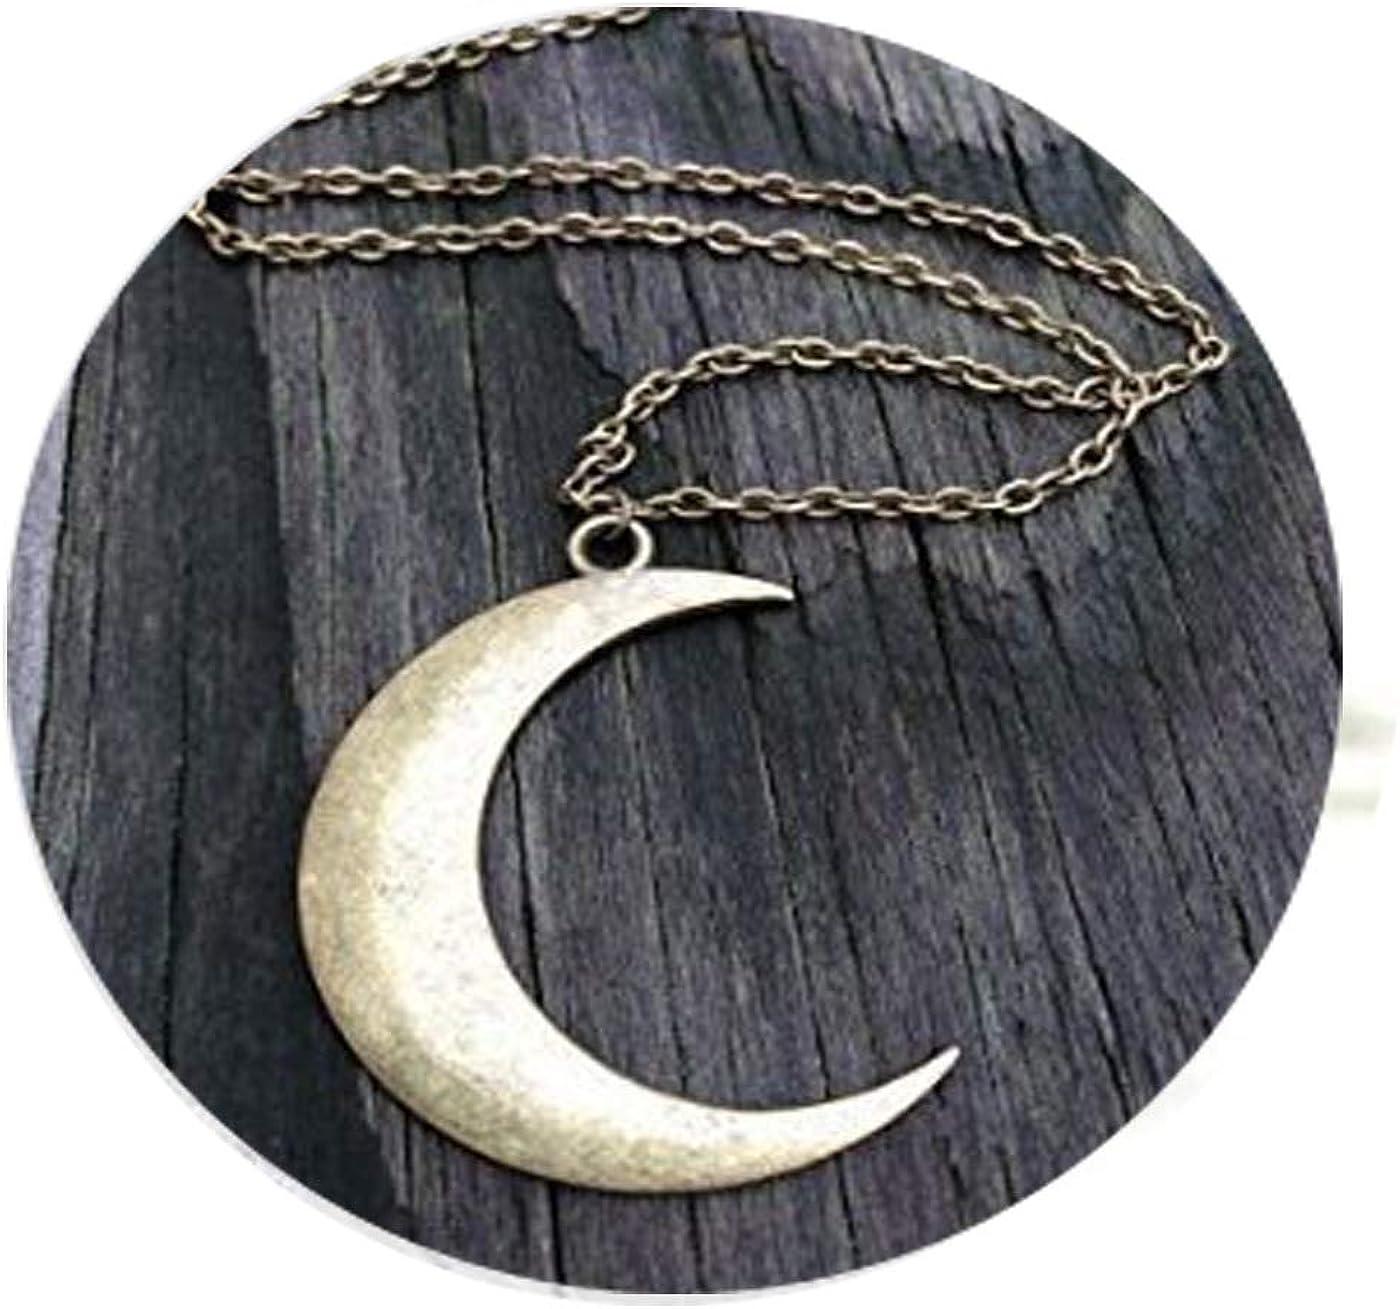 Brass Necklace Statement Necklace Mid-century Necklace Semicircle Necklace Half Moon Necklace